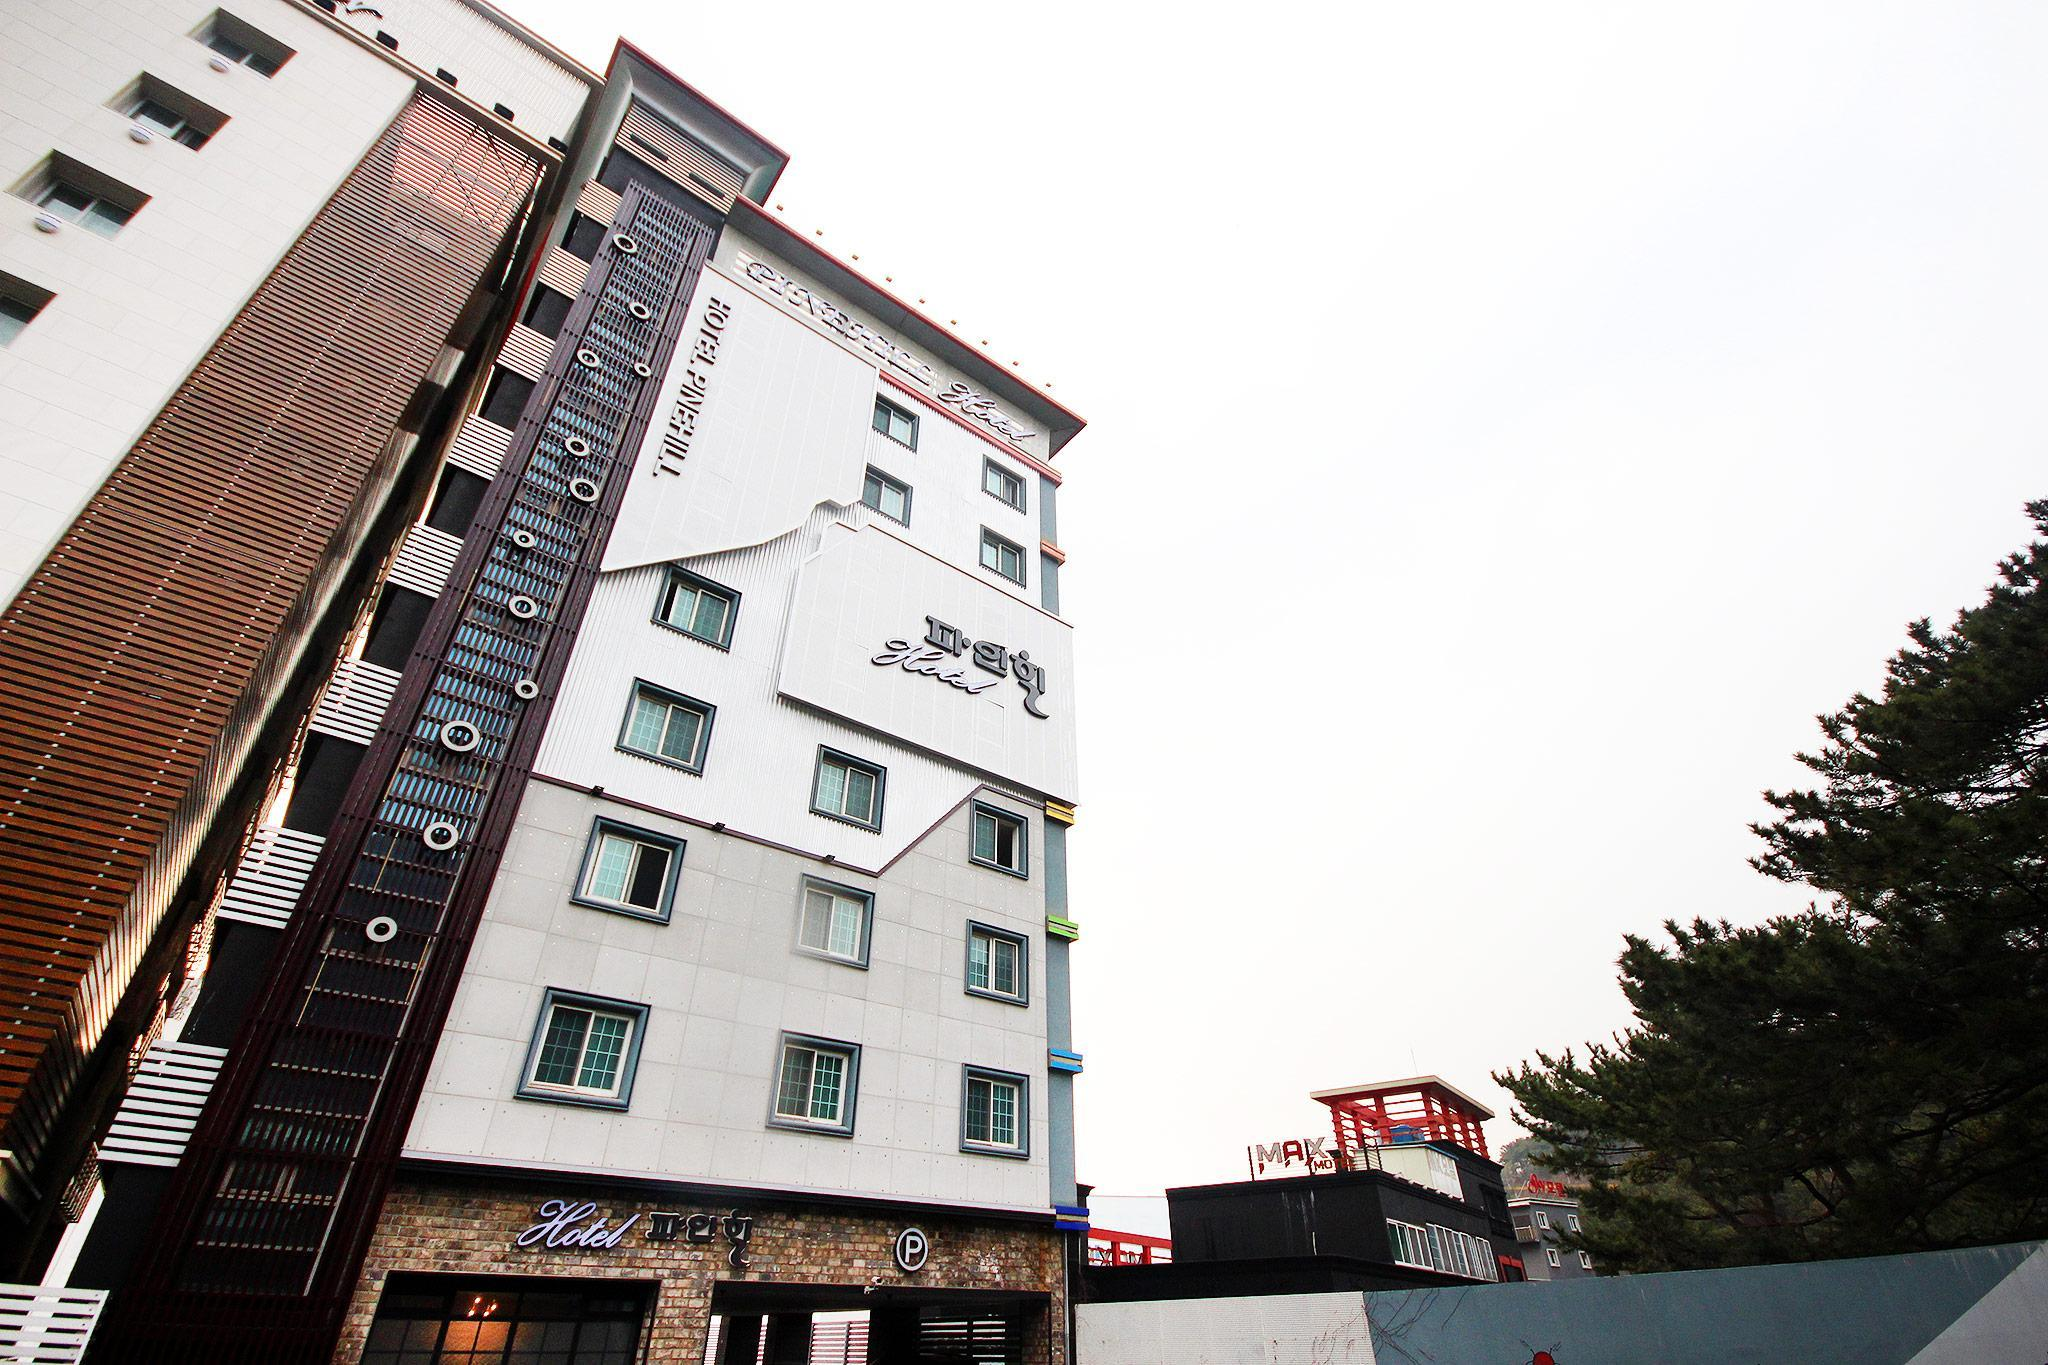 Songdo Pinehill Hotel, Saha